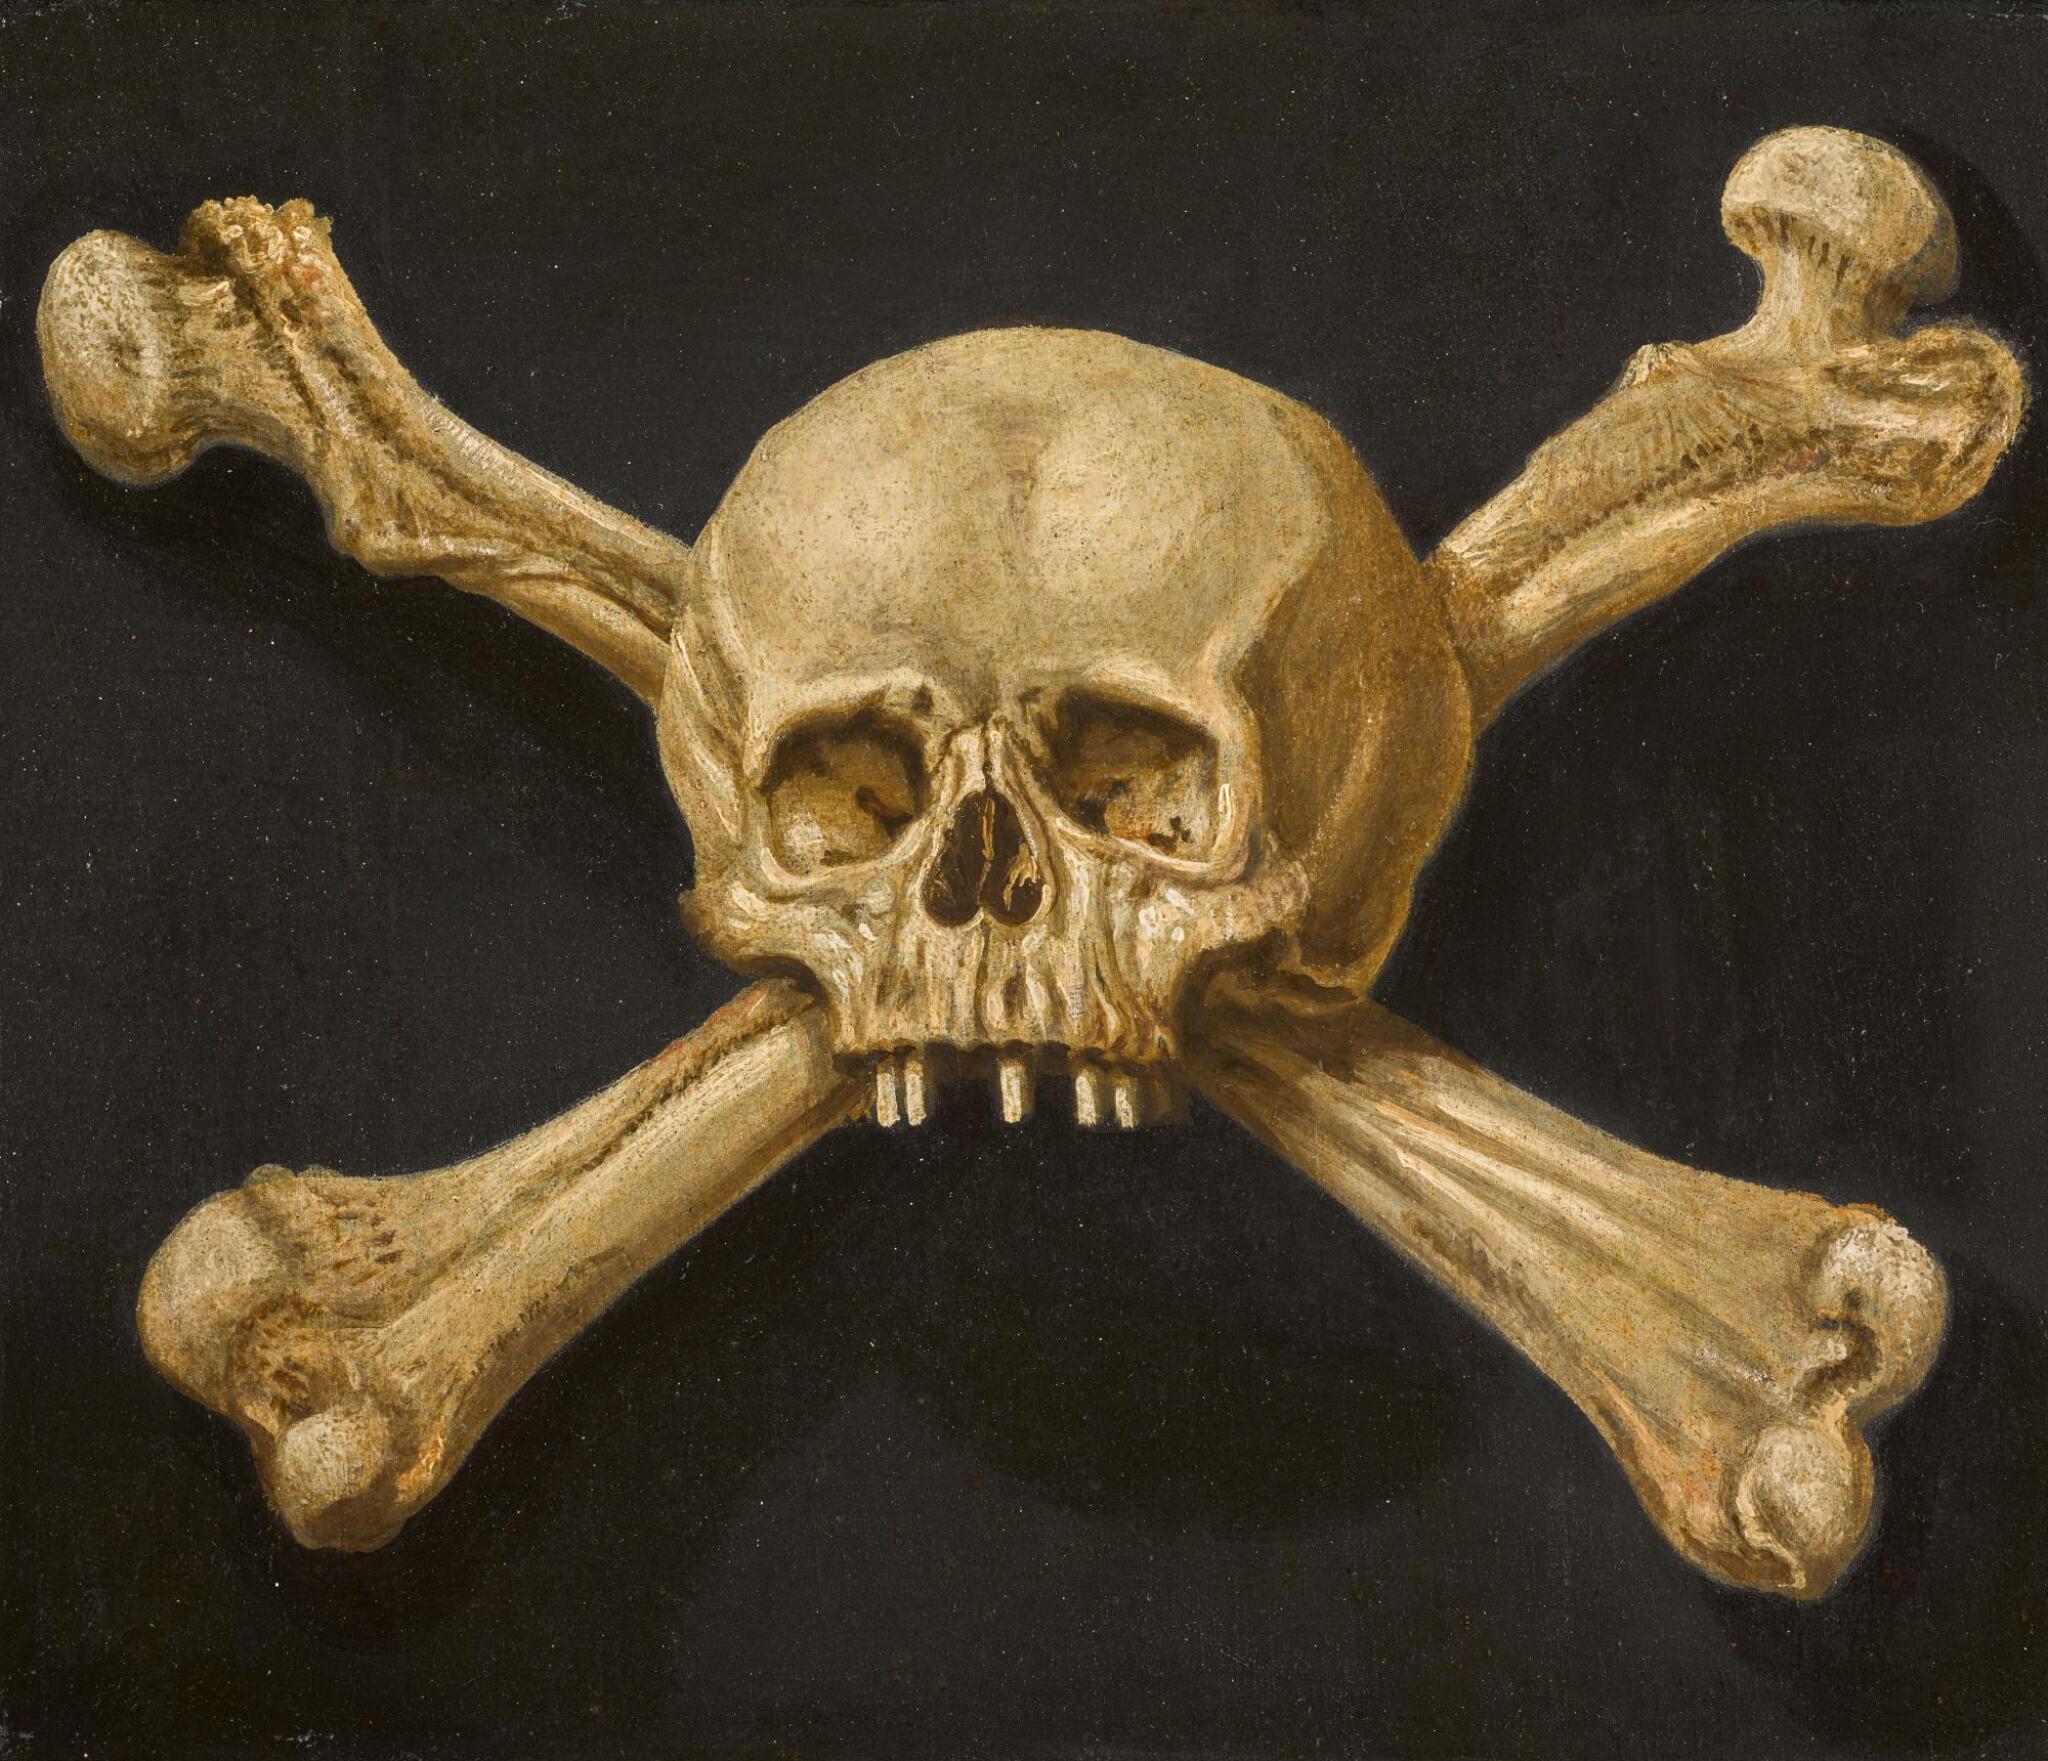 NEAPOLITAN SCHOOL, 17TH CENTURY | Amemento moriwith skull and crossbones